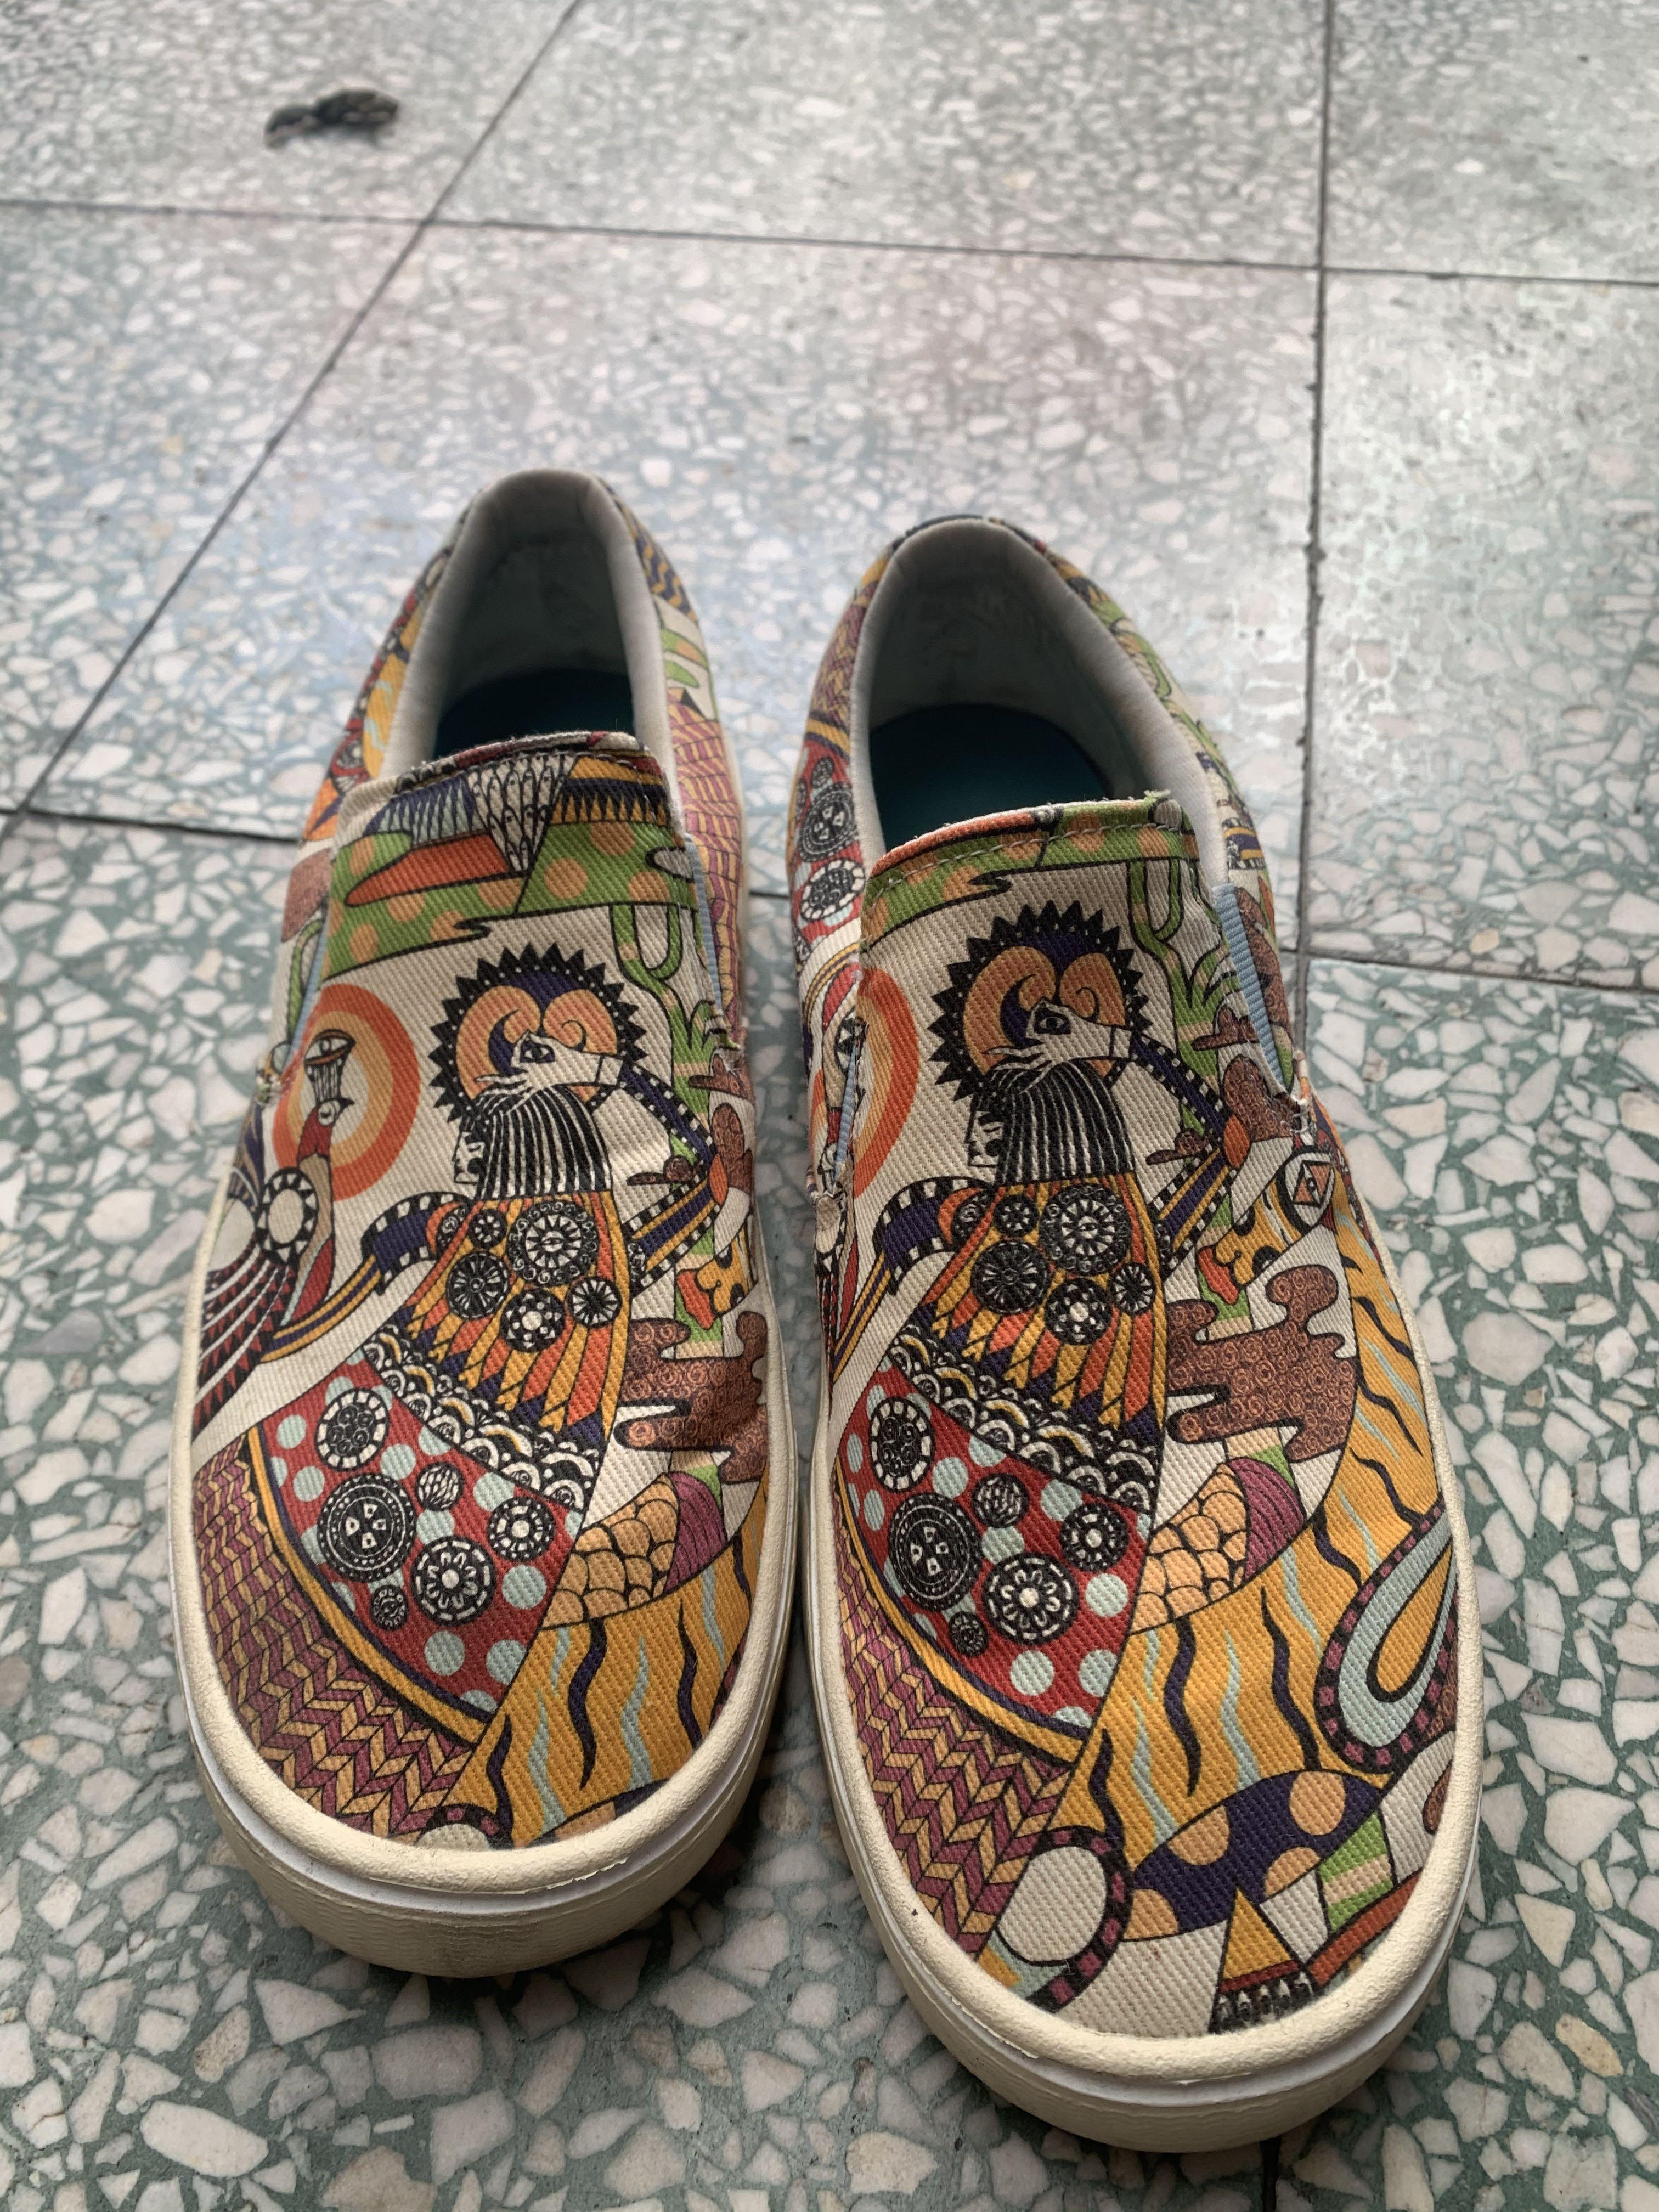 Native帆布鞋,懶人鞋